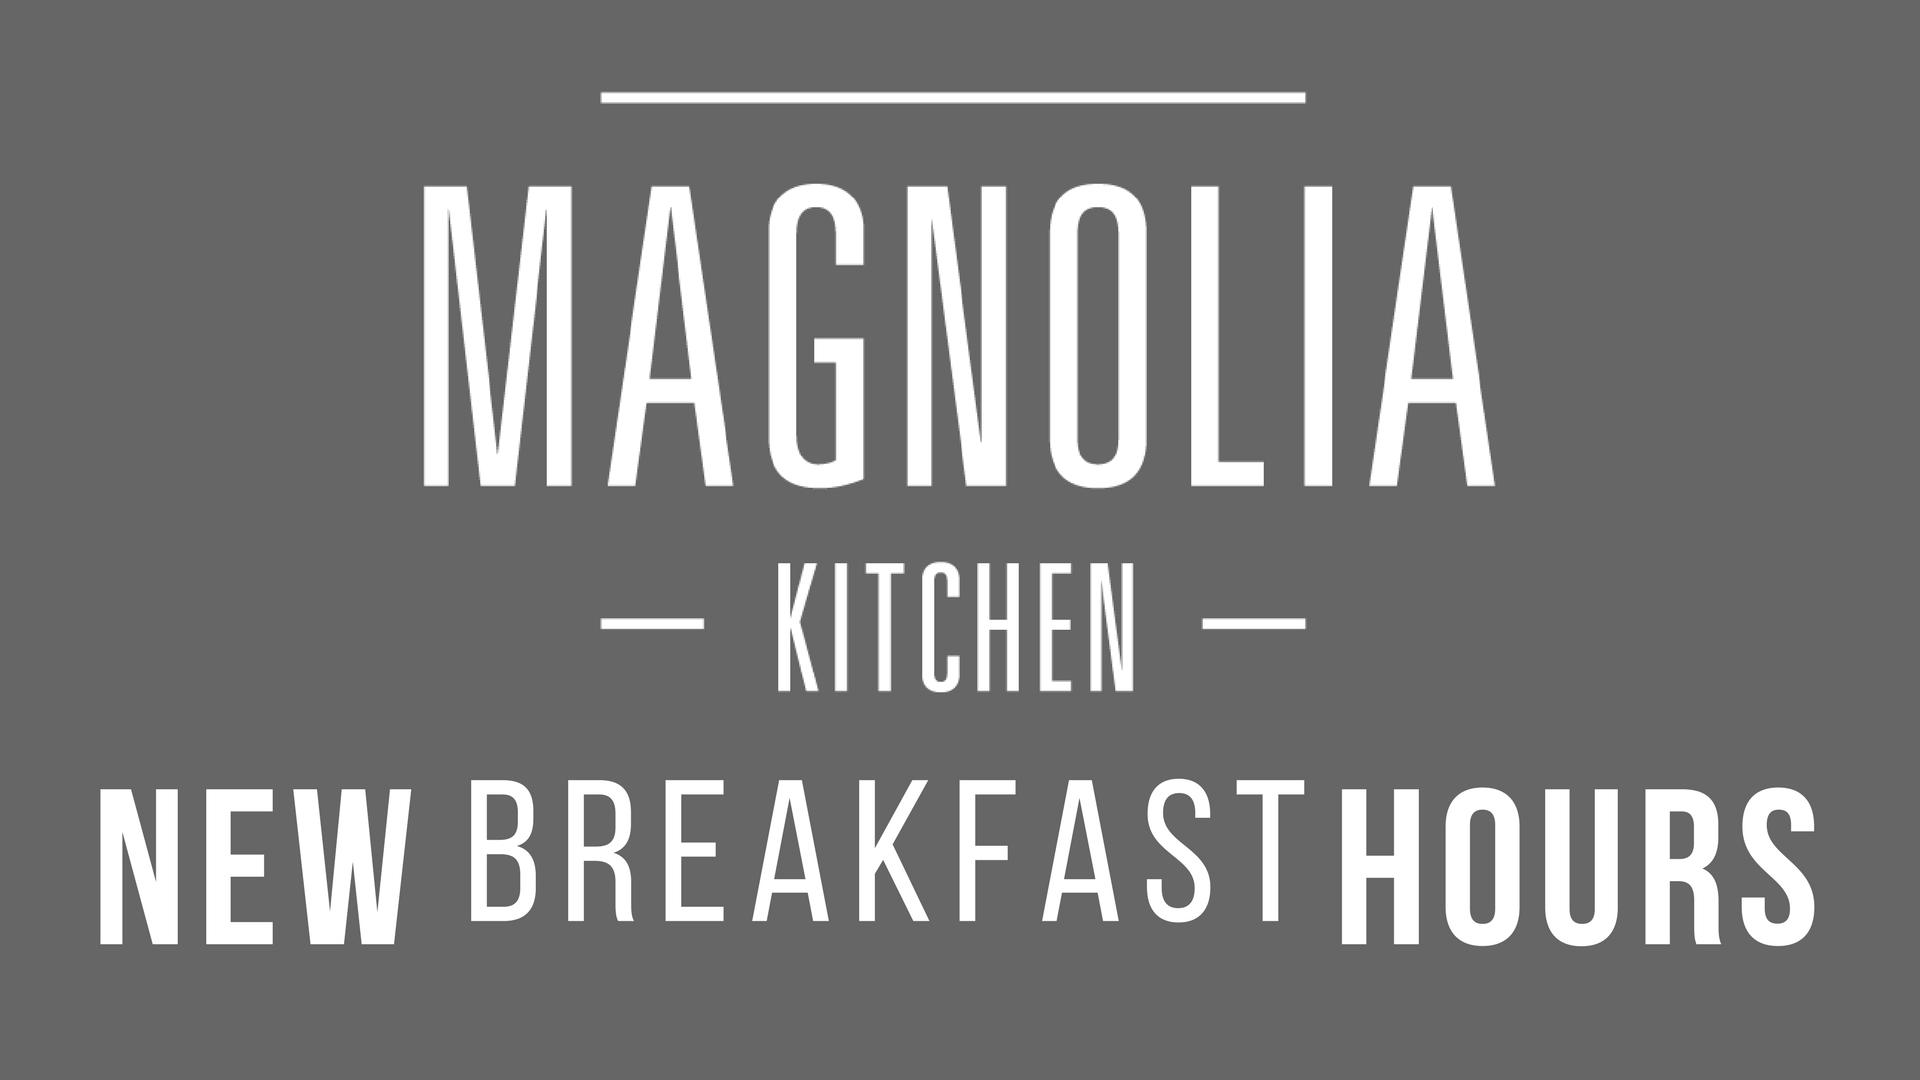 Magnolia kitchen hours change beginning november 2